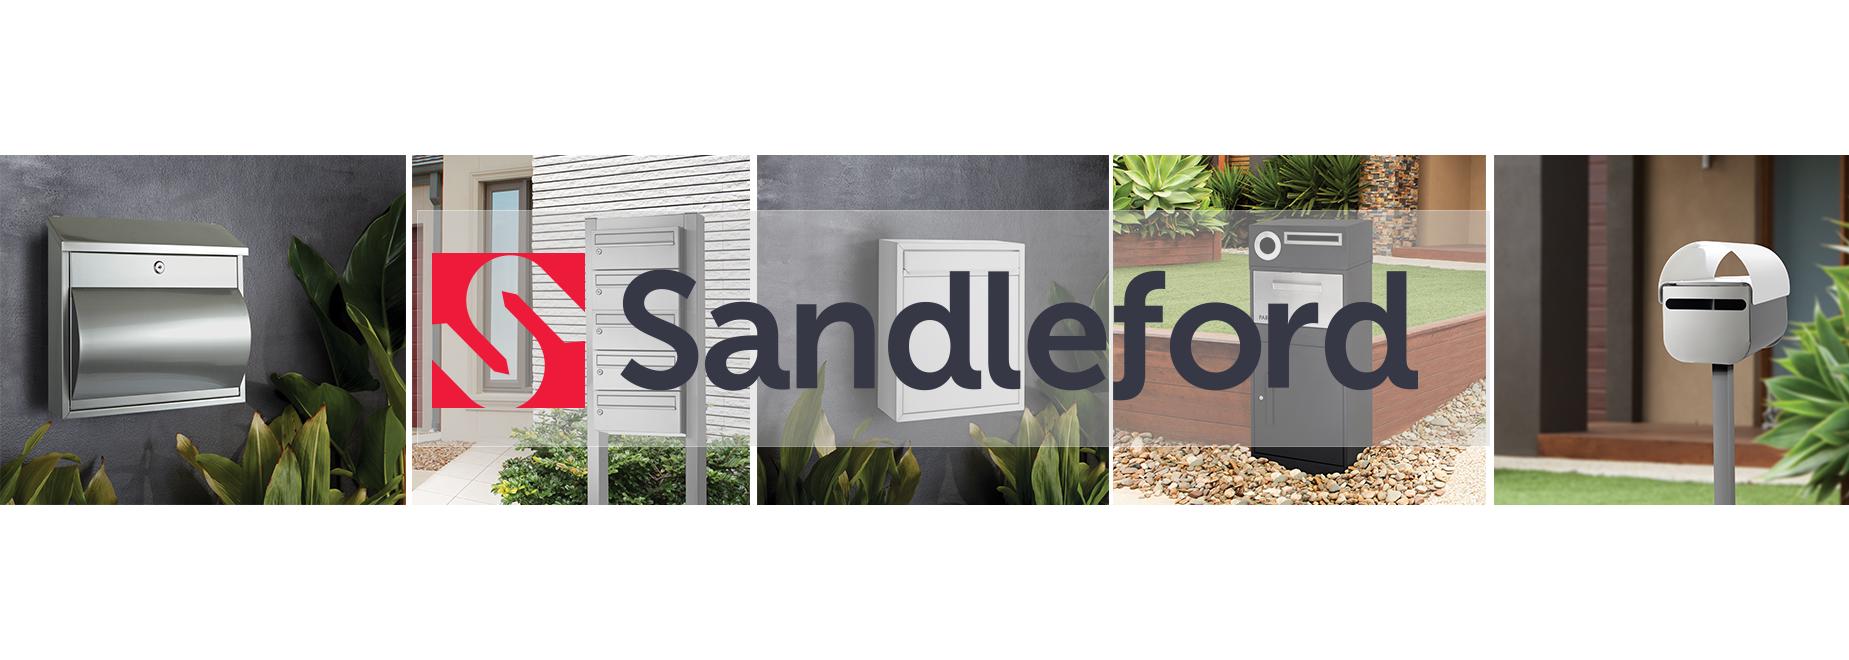 sandleford.png